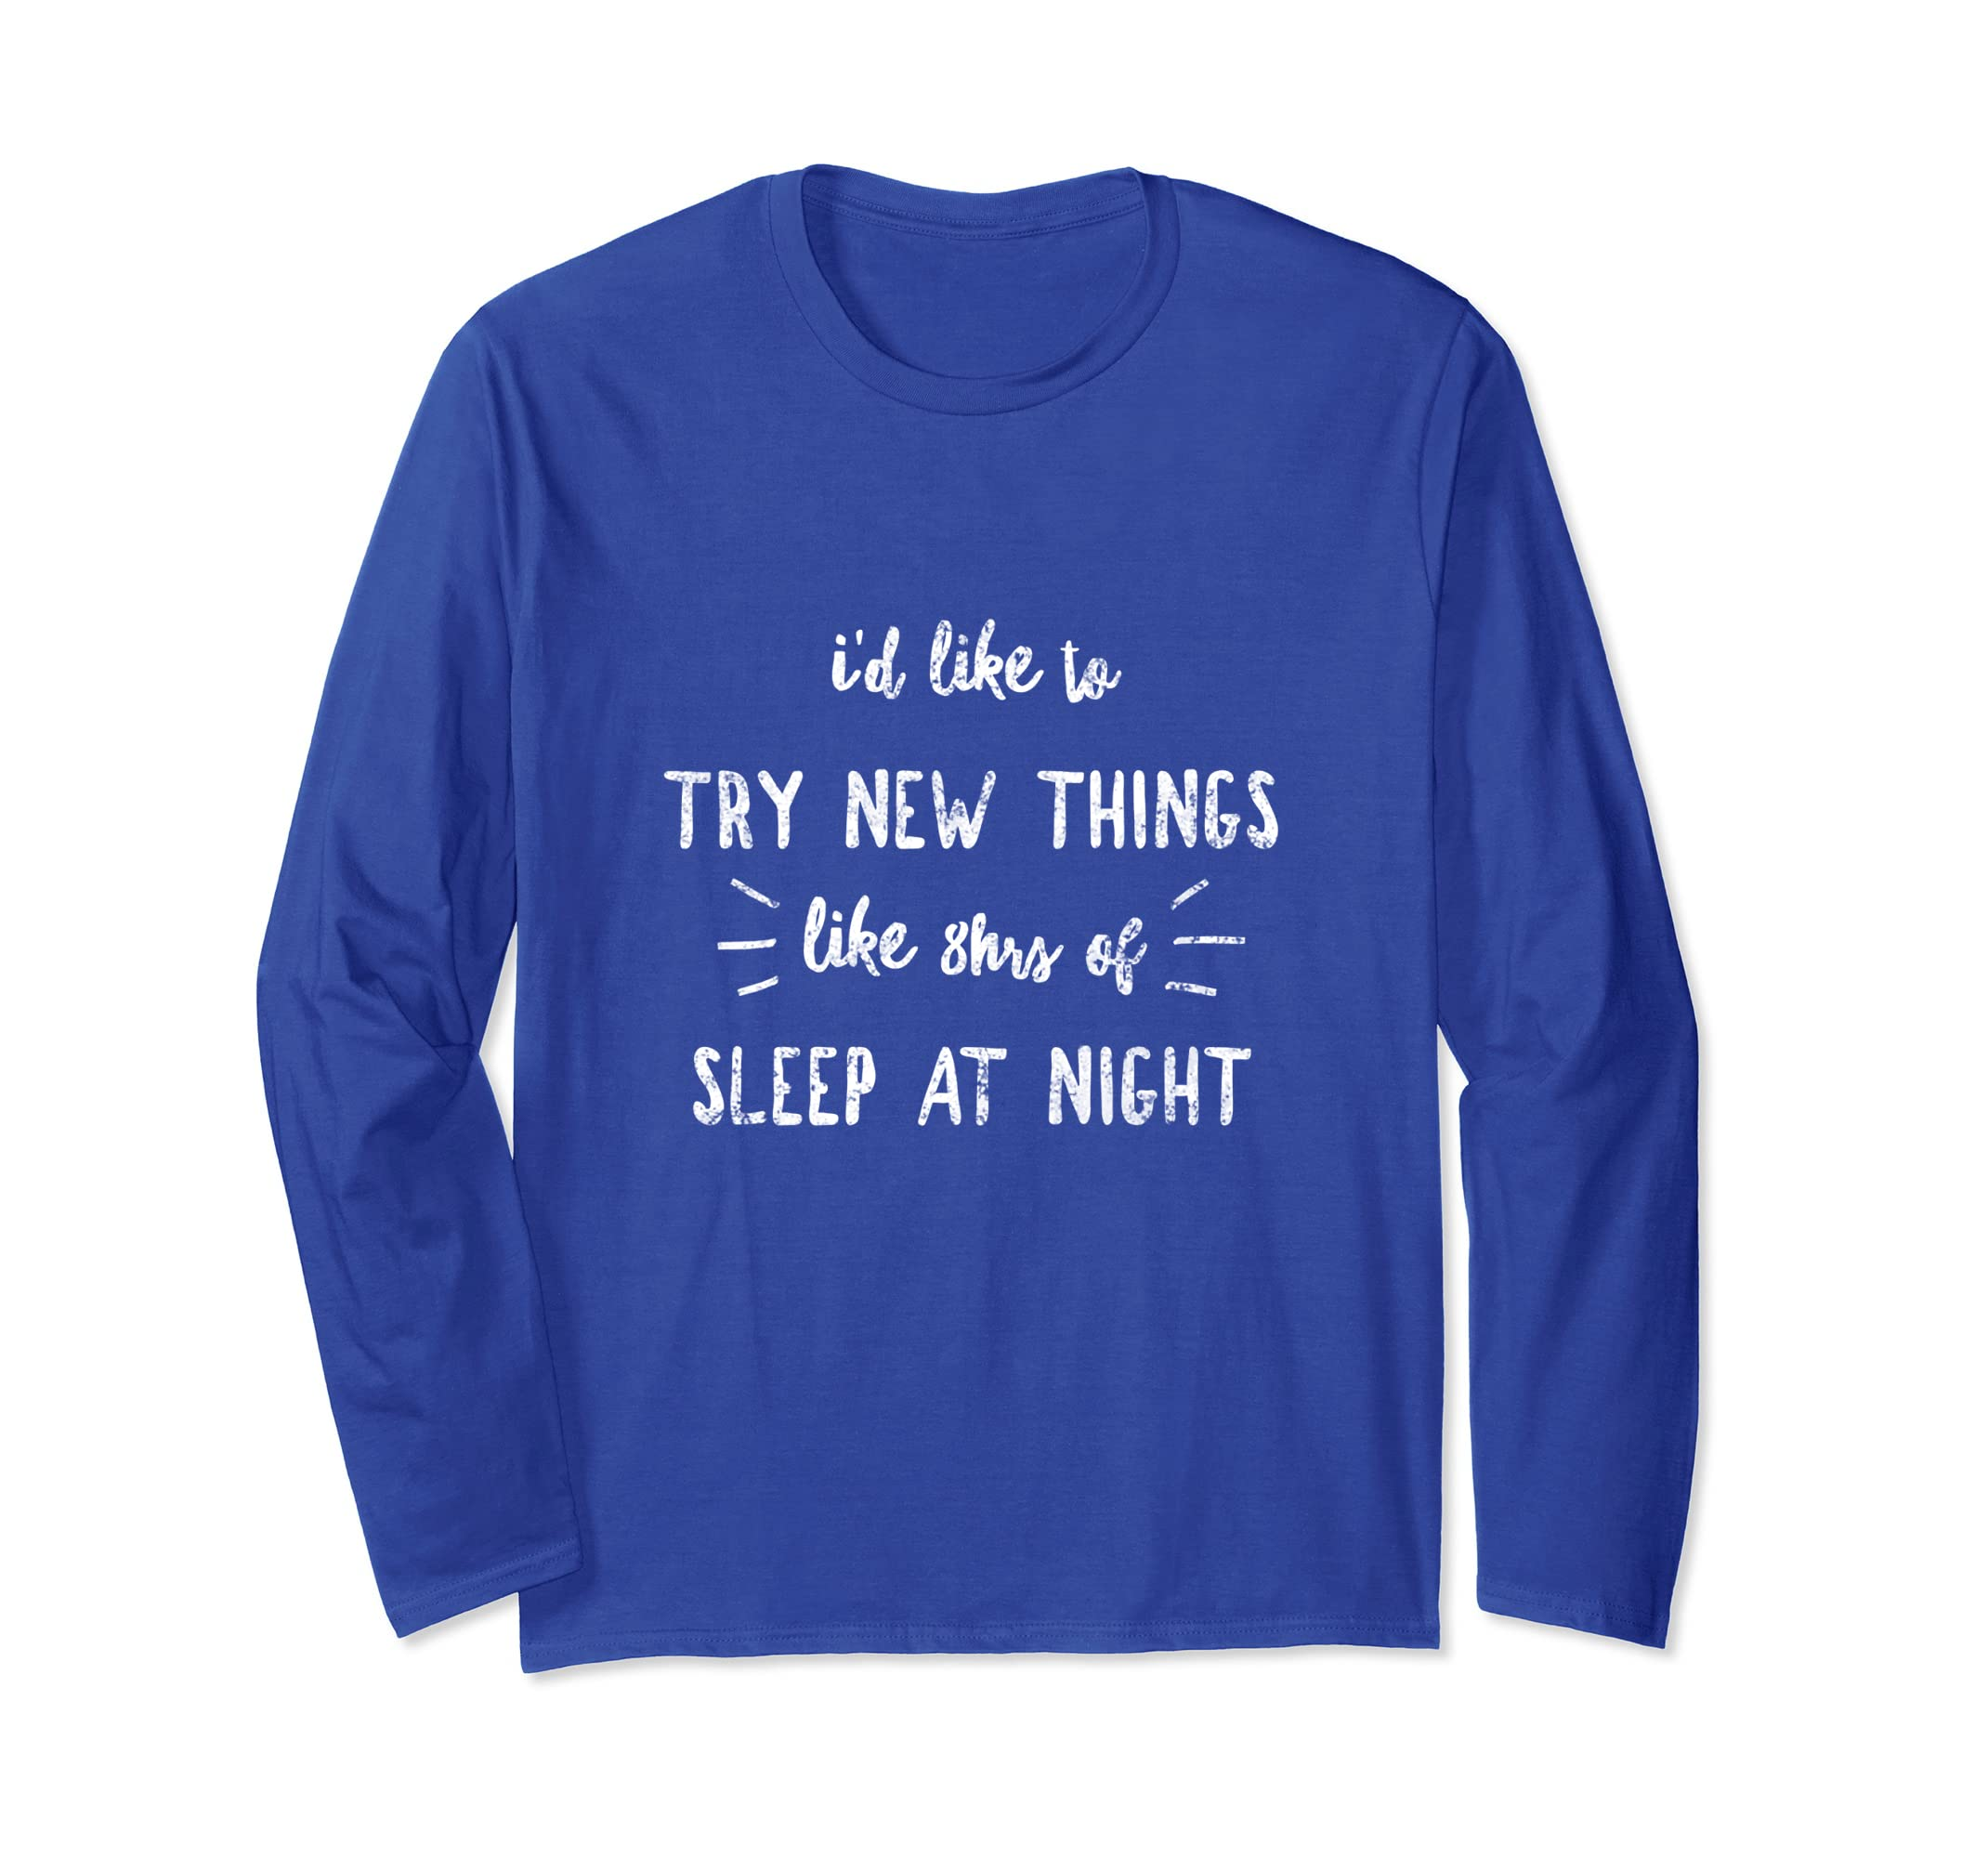 | Try New Things Like 8hrs of Sleep Tired Mom Tshirt-ln